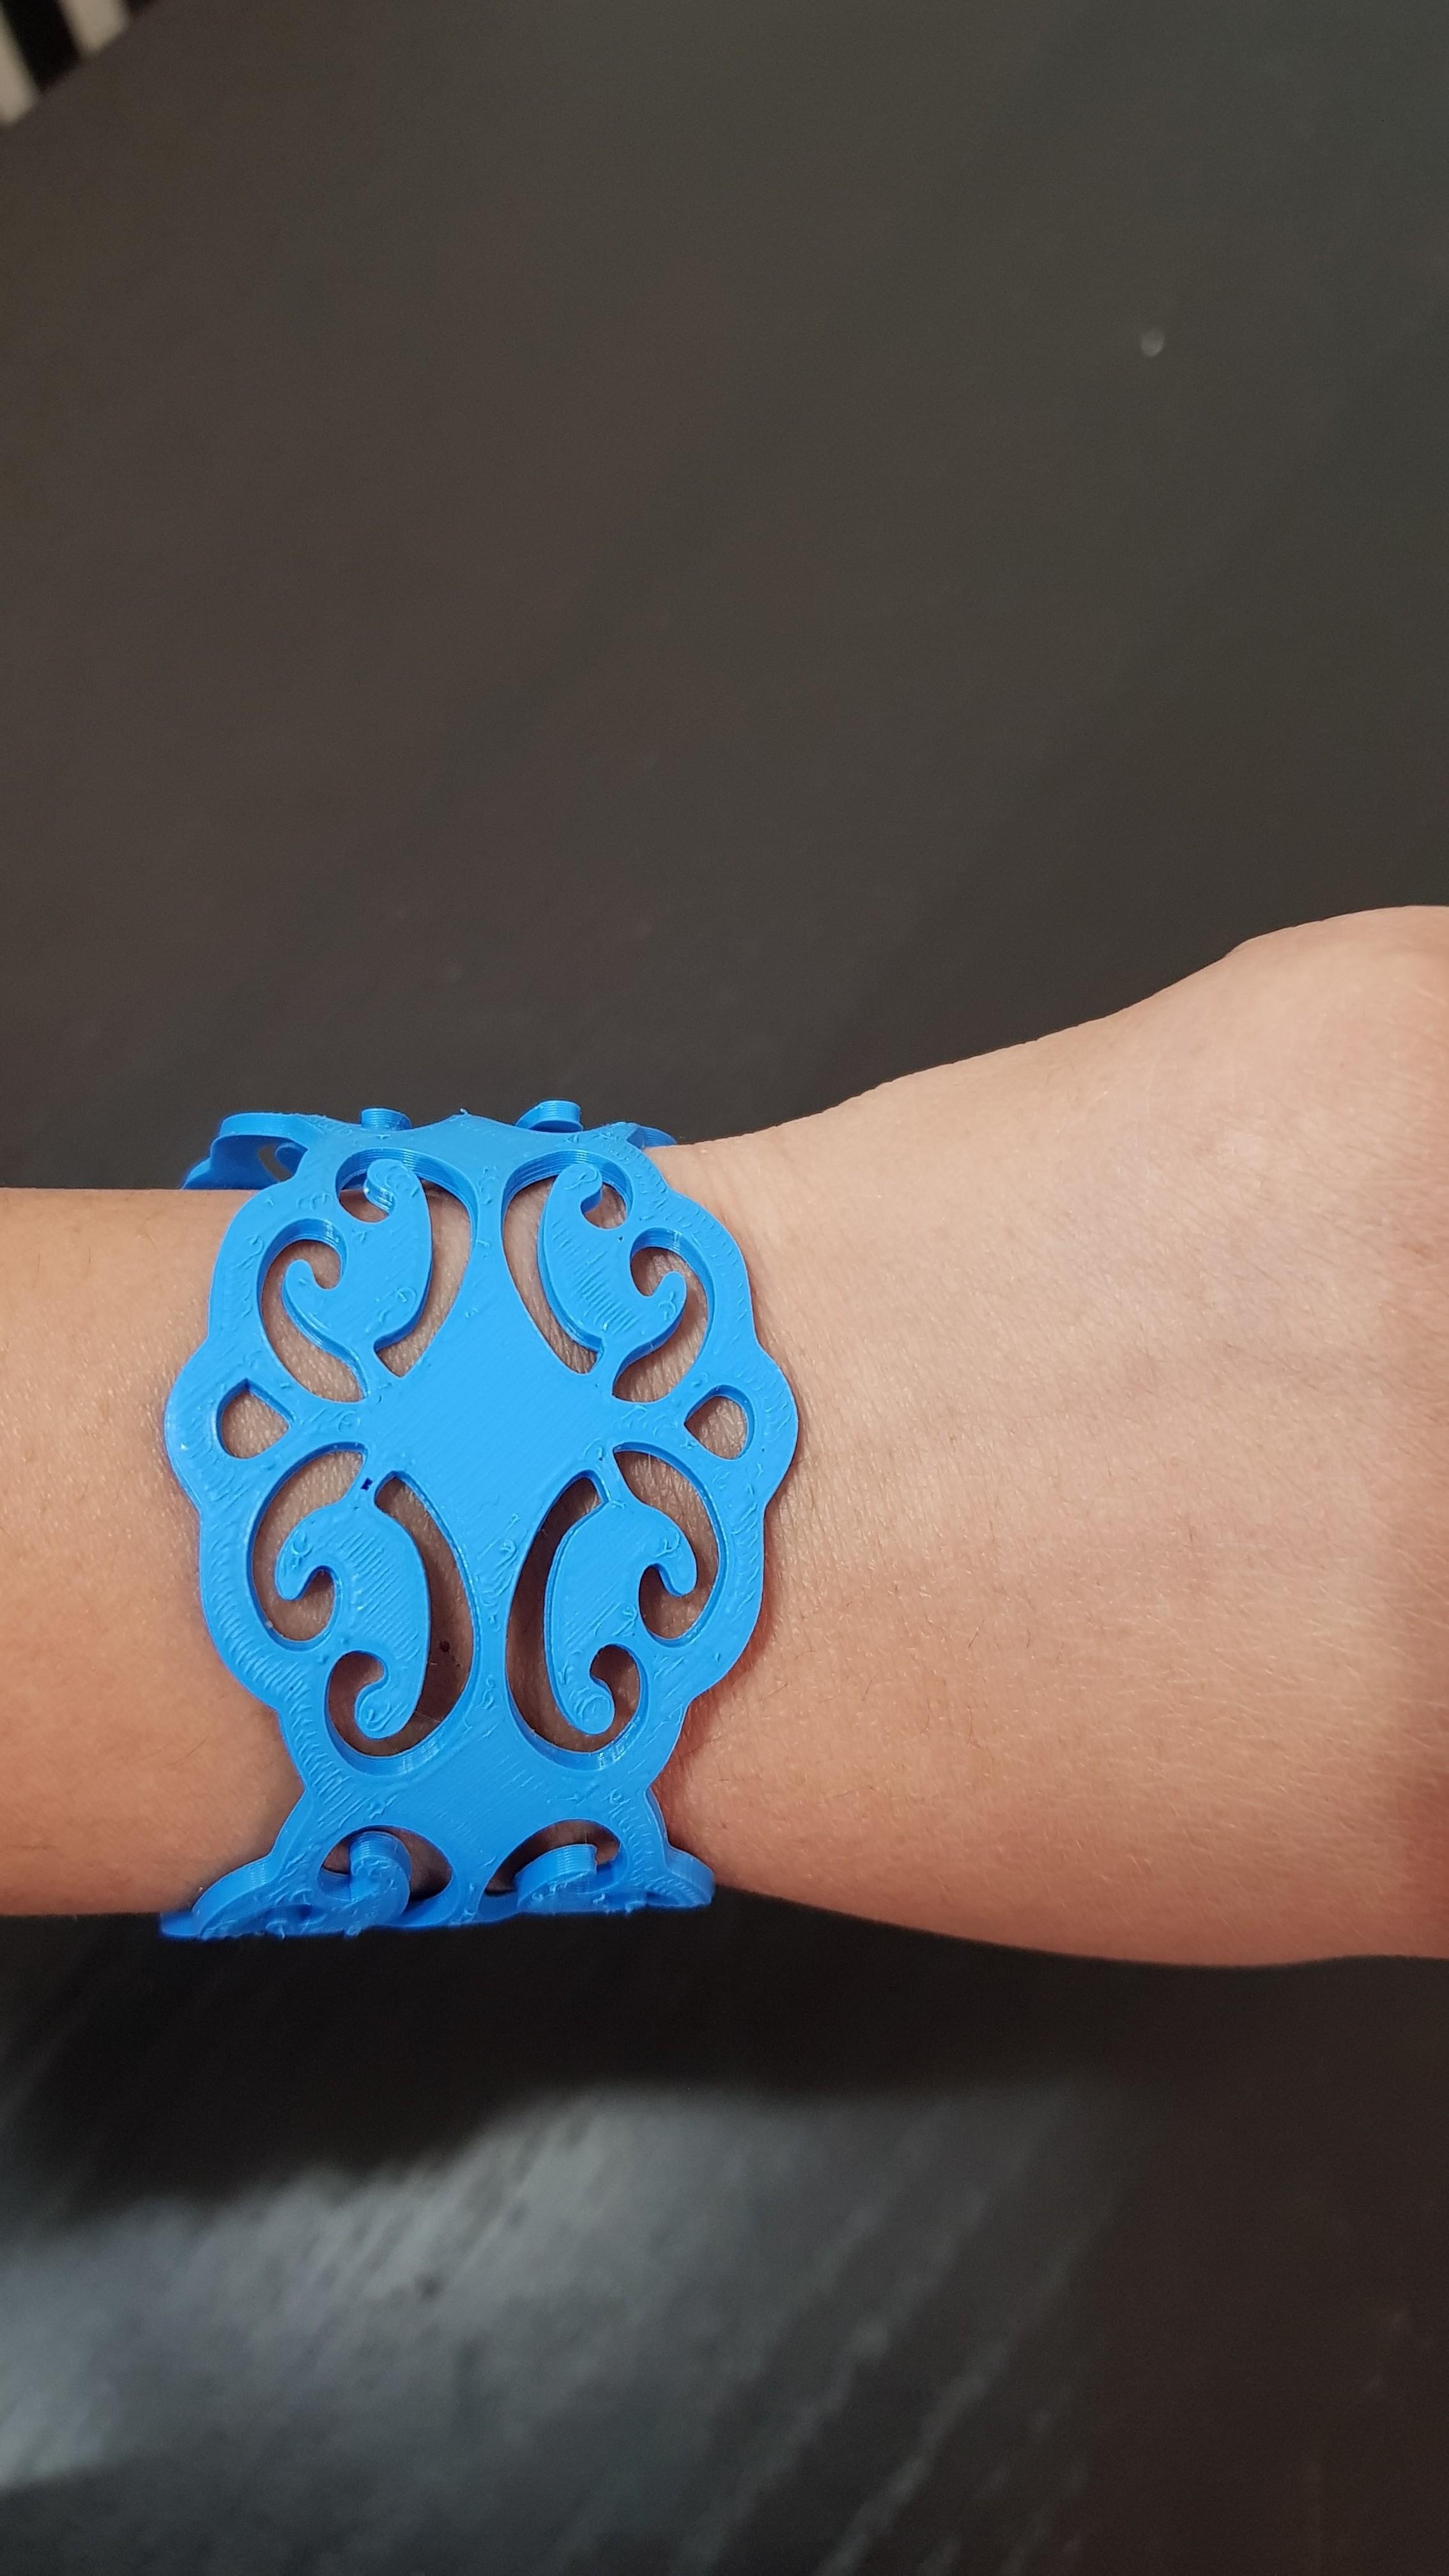 20180416_195025.jpg Download STL file Bracelet • 3D printing model, solunkejagruti